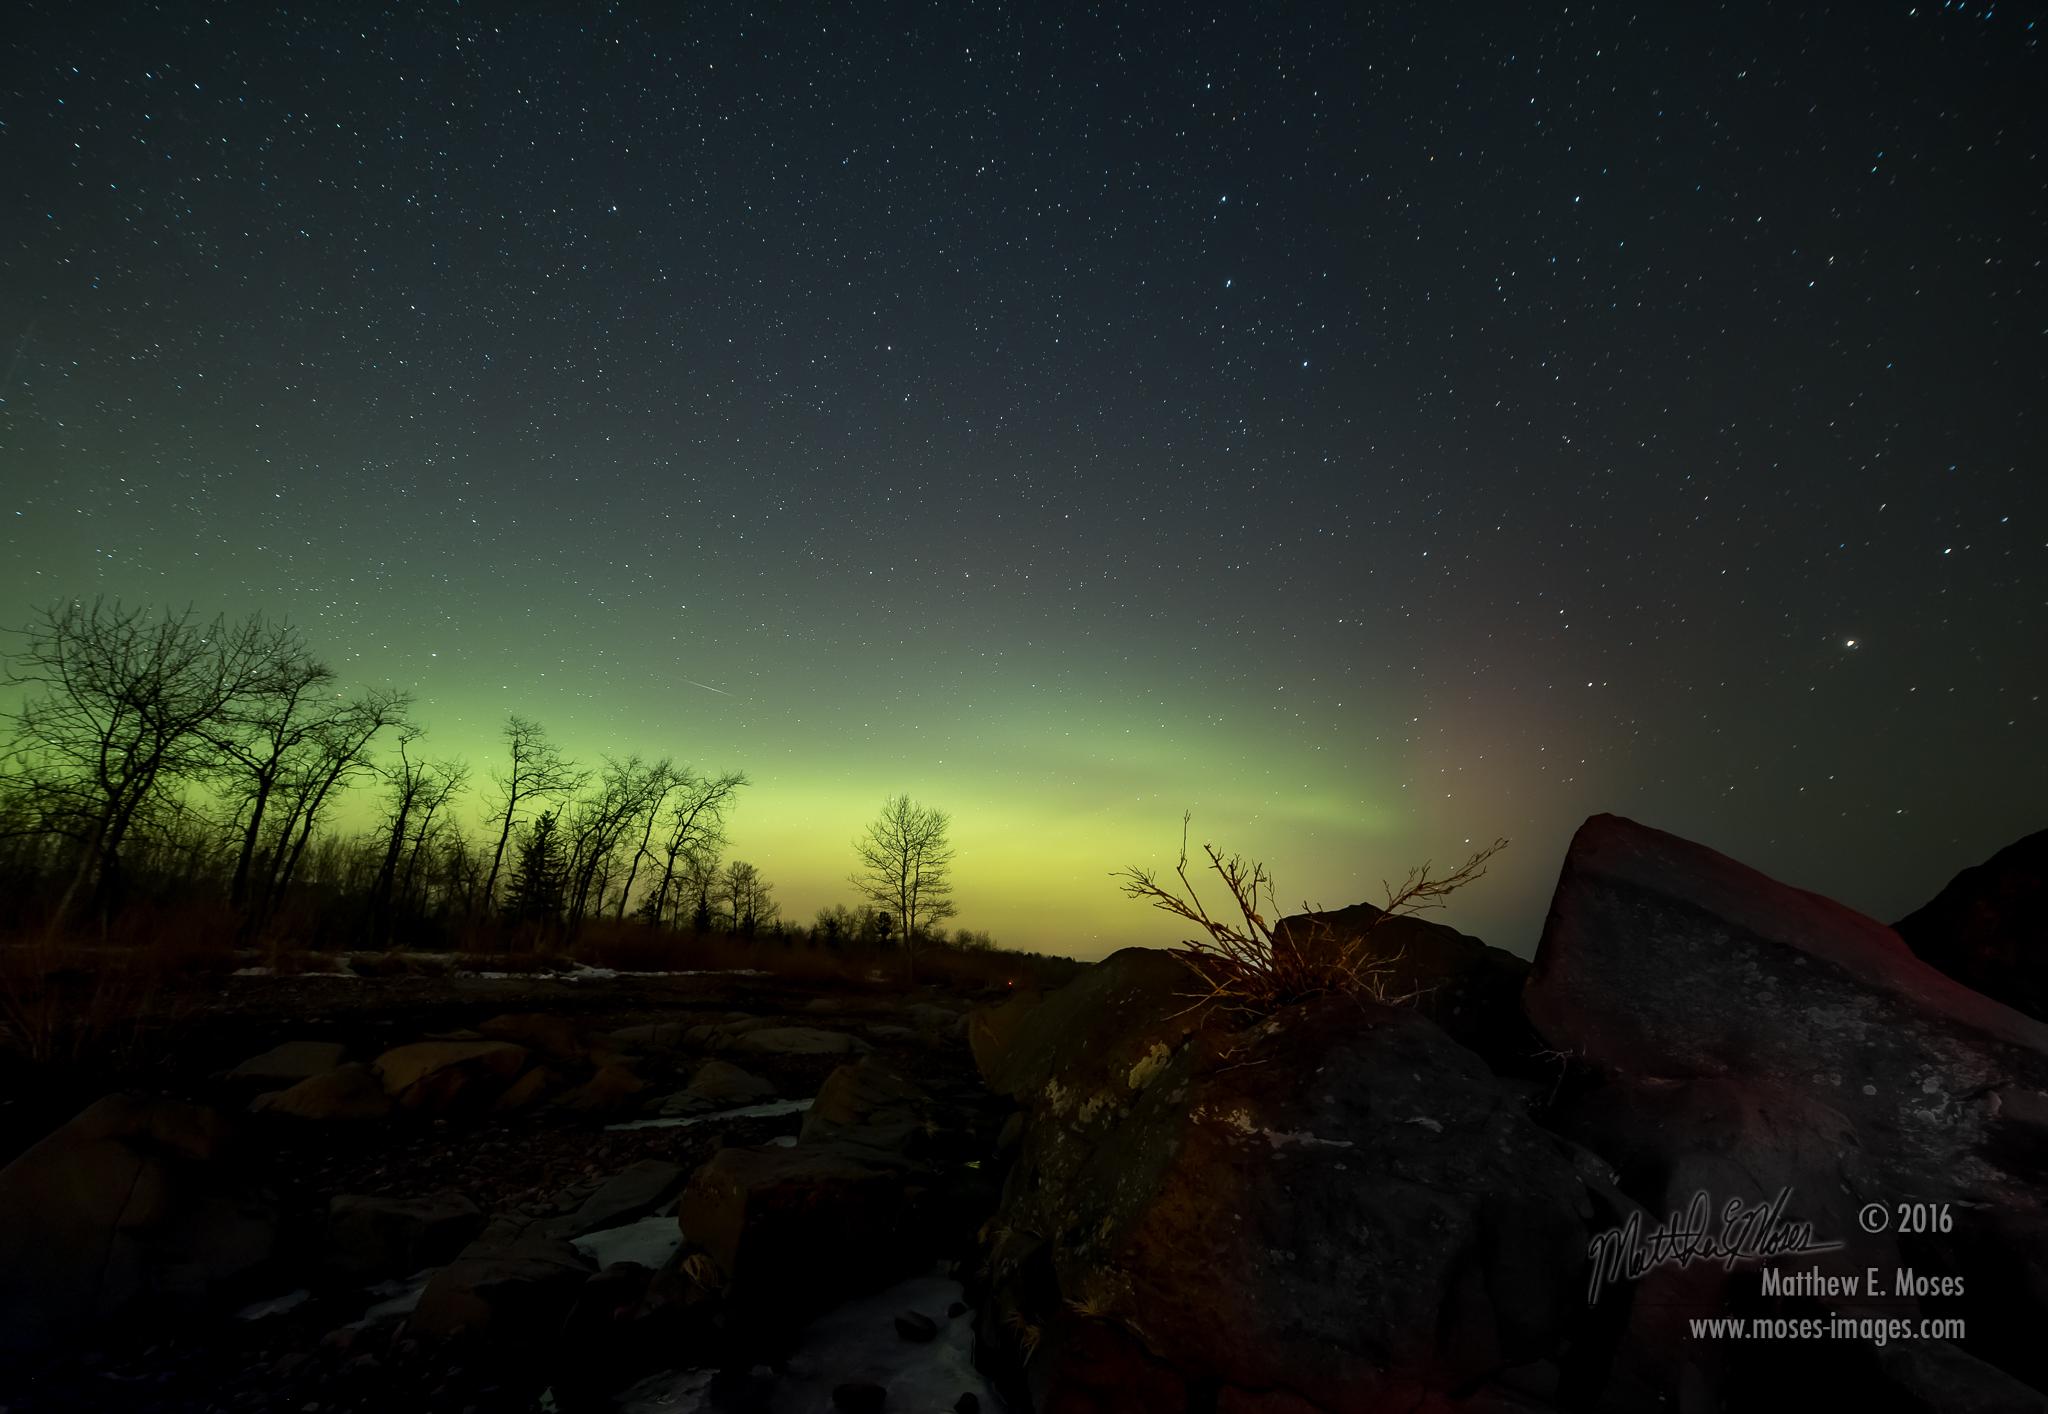 Green Aurora Lights Up the Minnesota Night in Skywatcher Photo